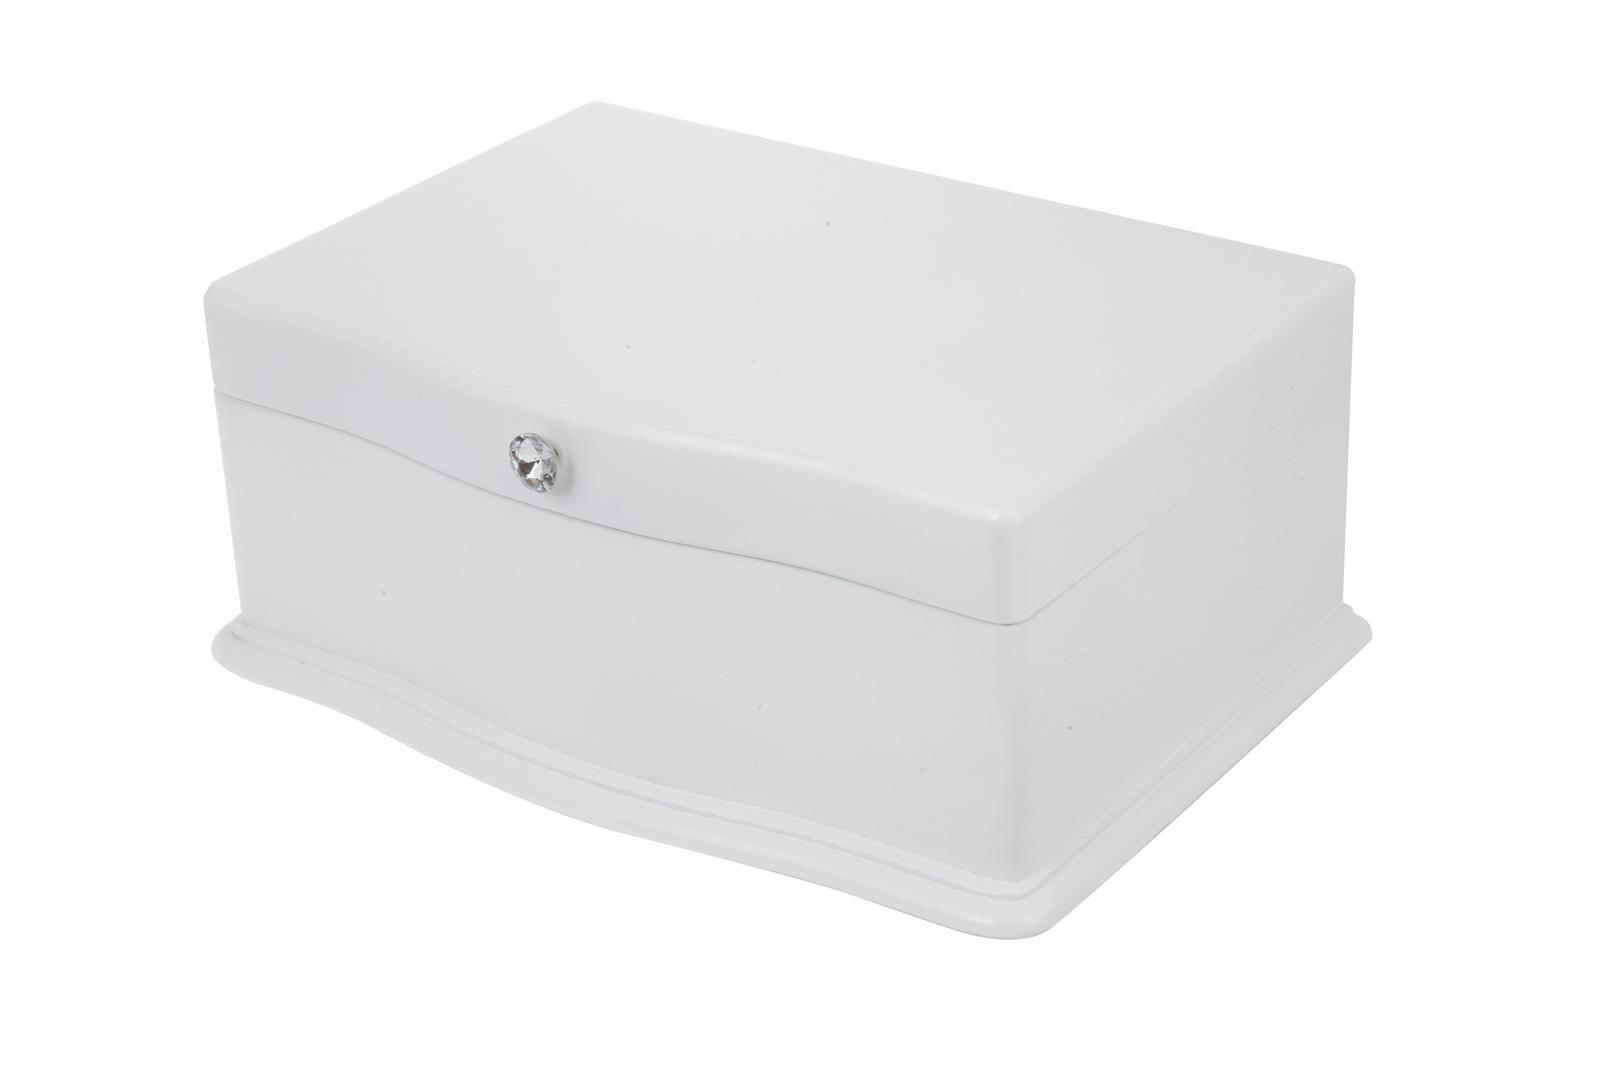 Шкатулка для украшений IsmatDecor, S-123B, белый